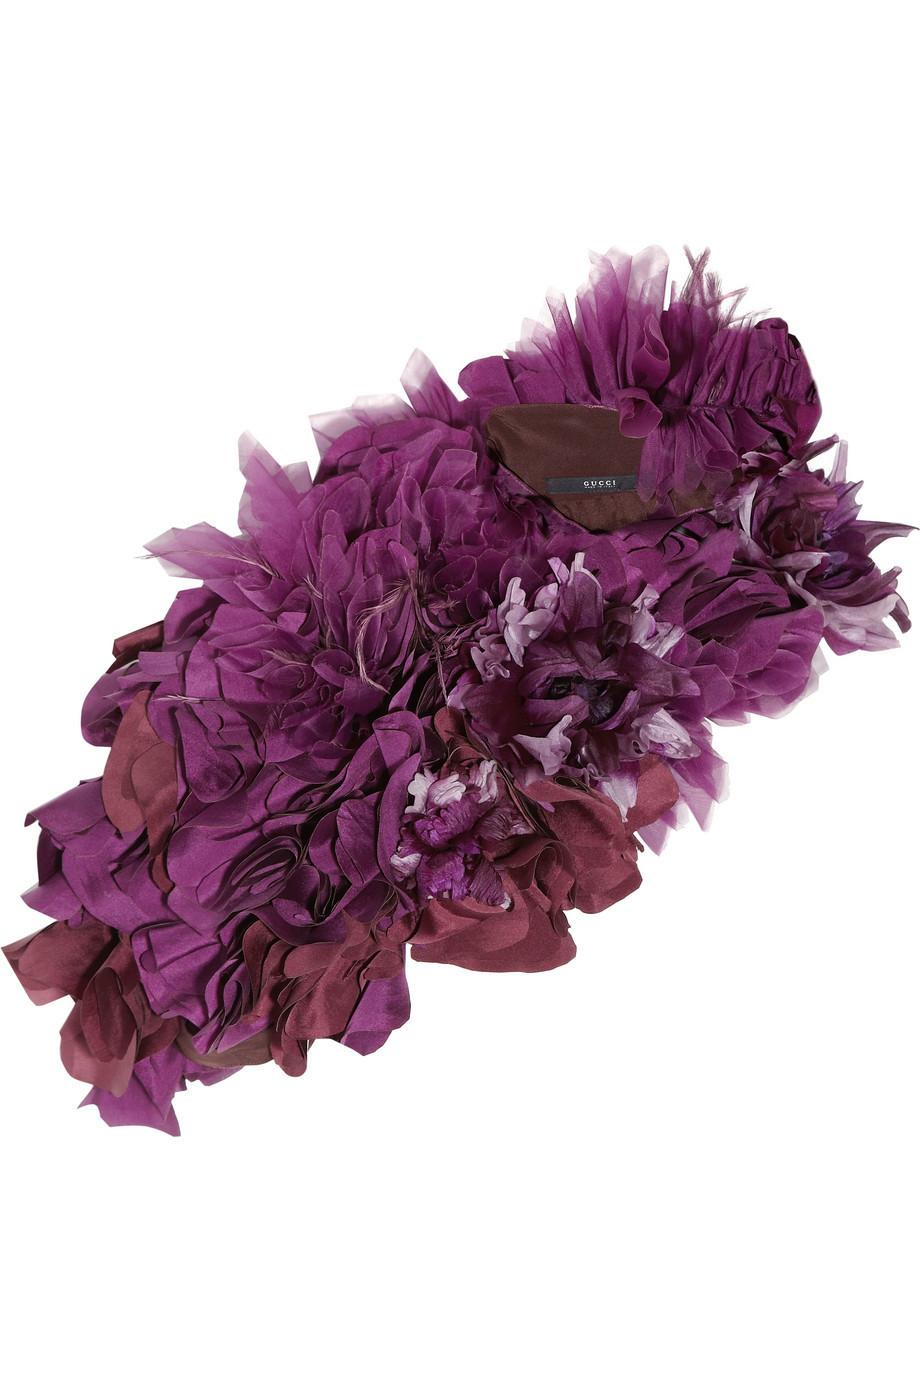 Gucci Silk-Organza Floral Collar, Size: 38